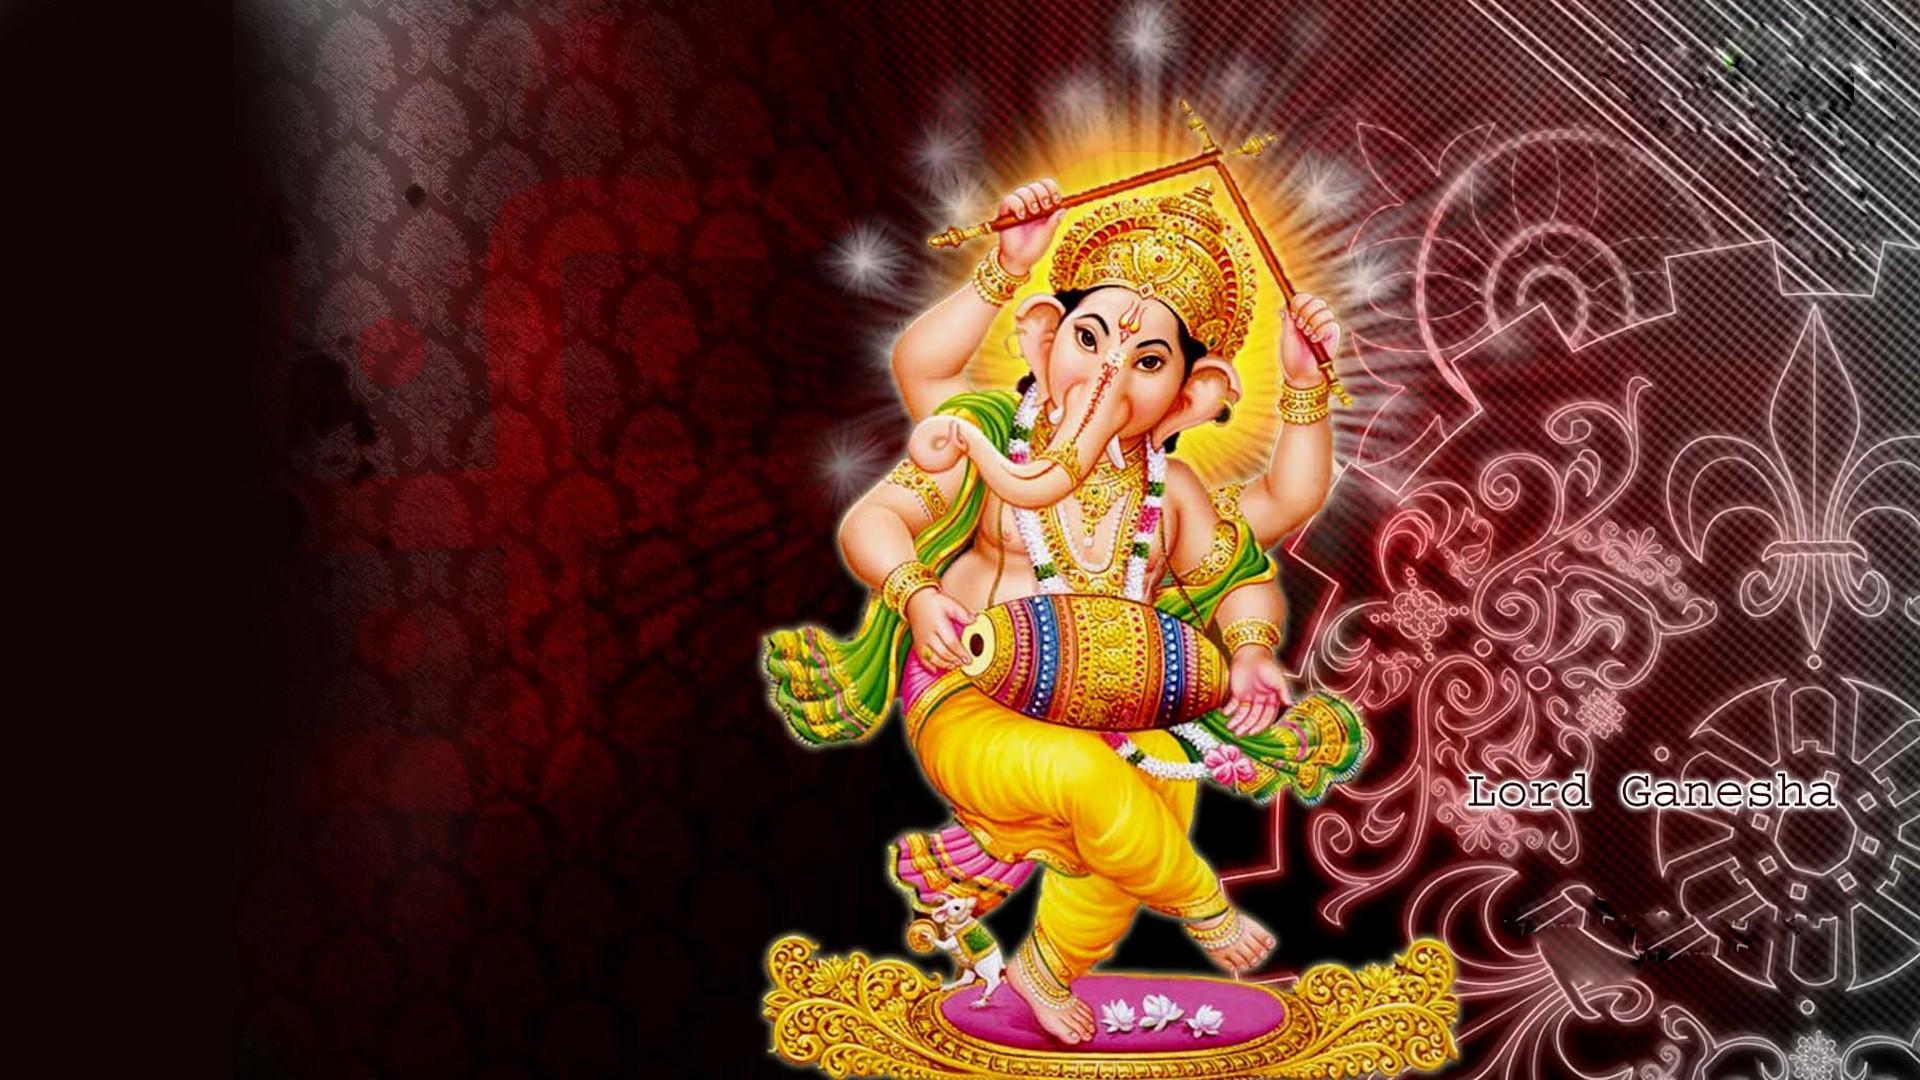 1920x1080 lord ganesha indian god hd desktop wallpapers hd wallpapers